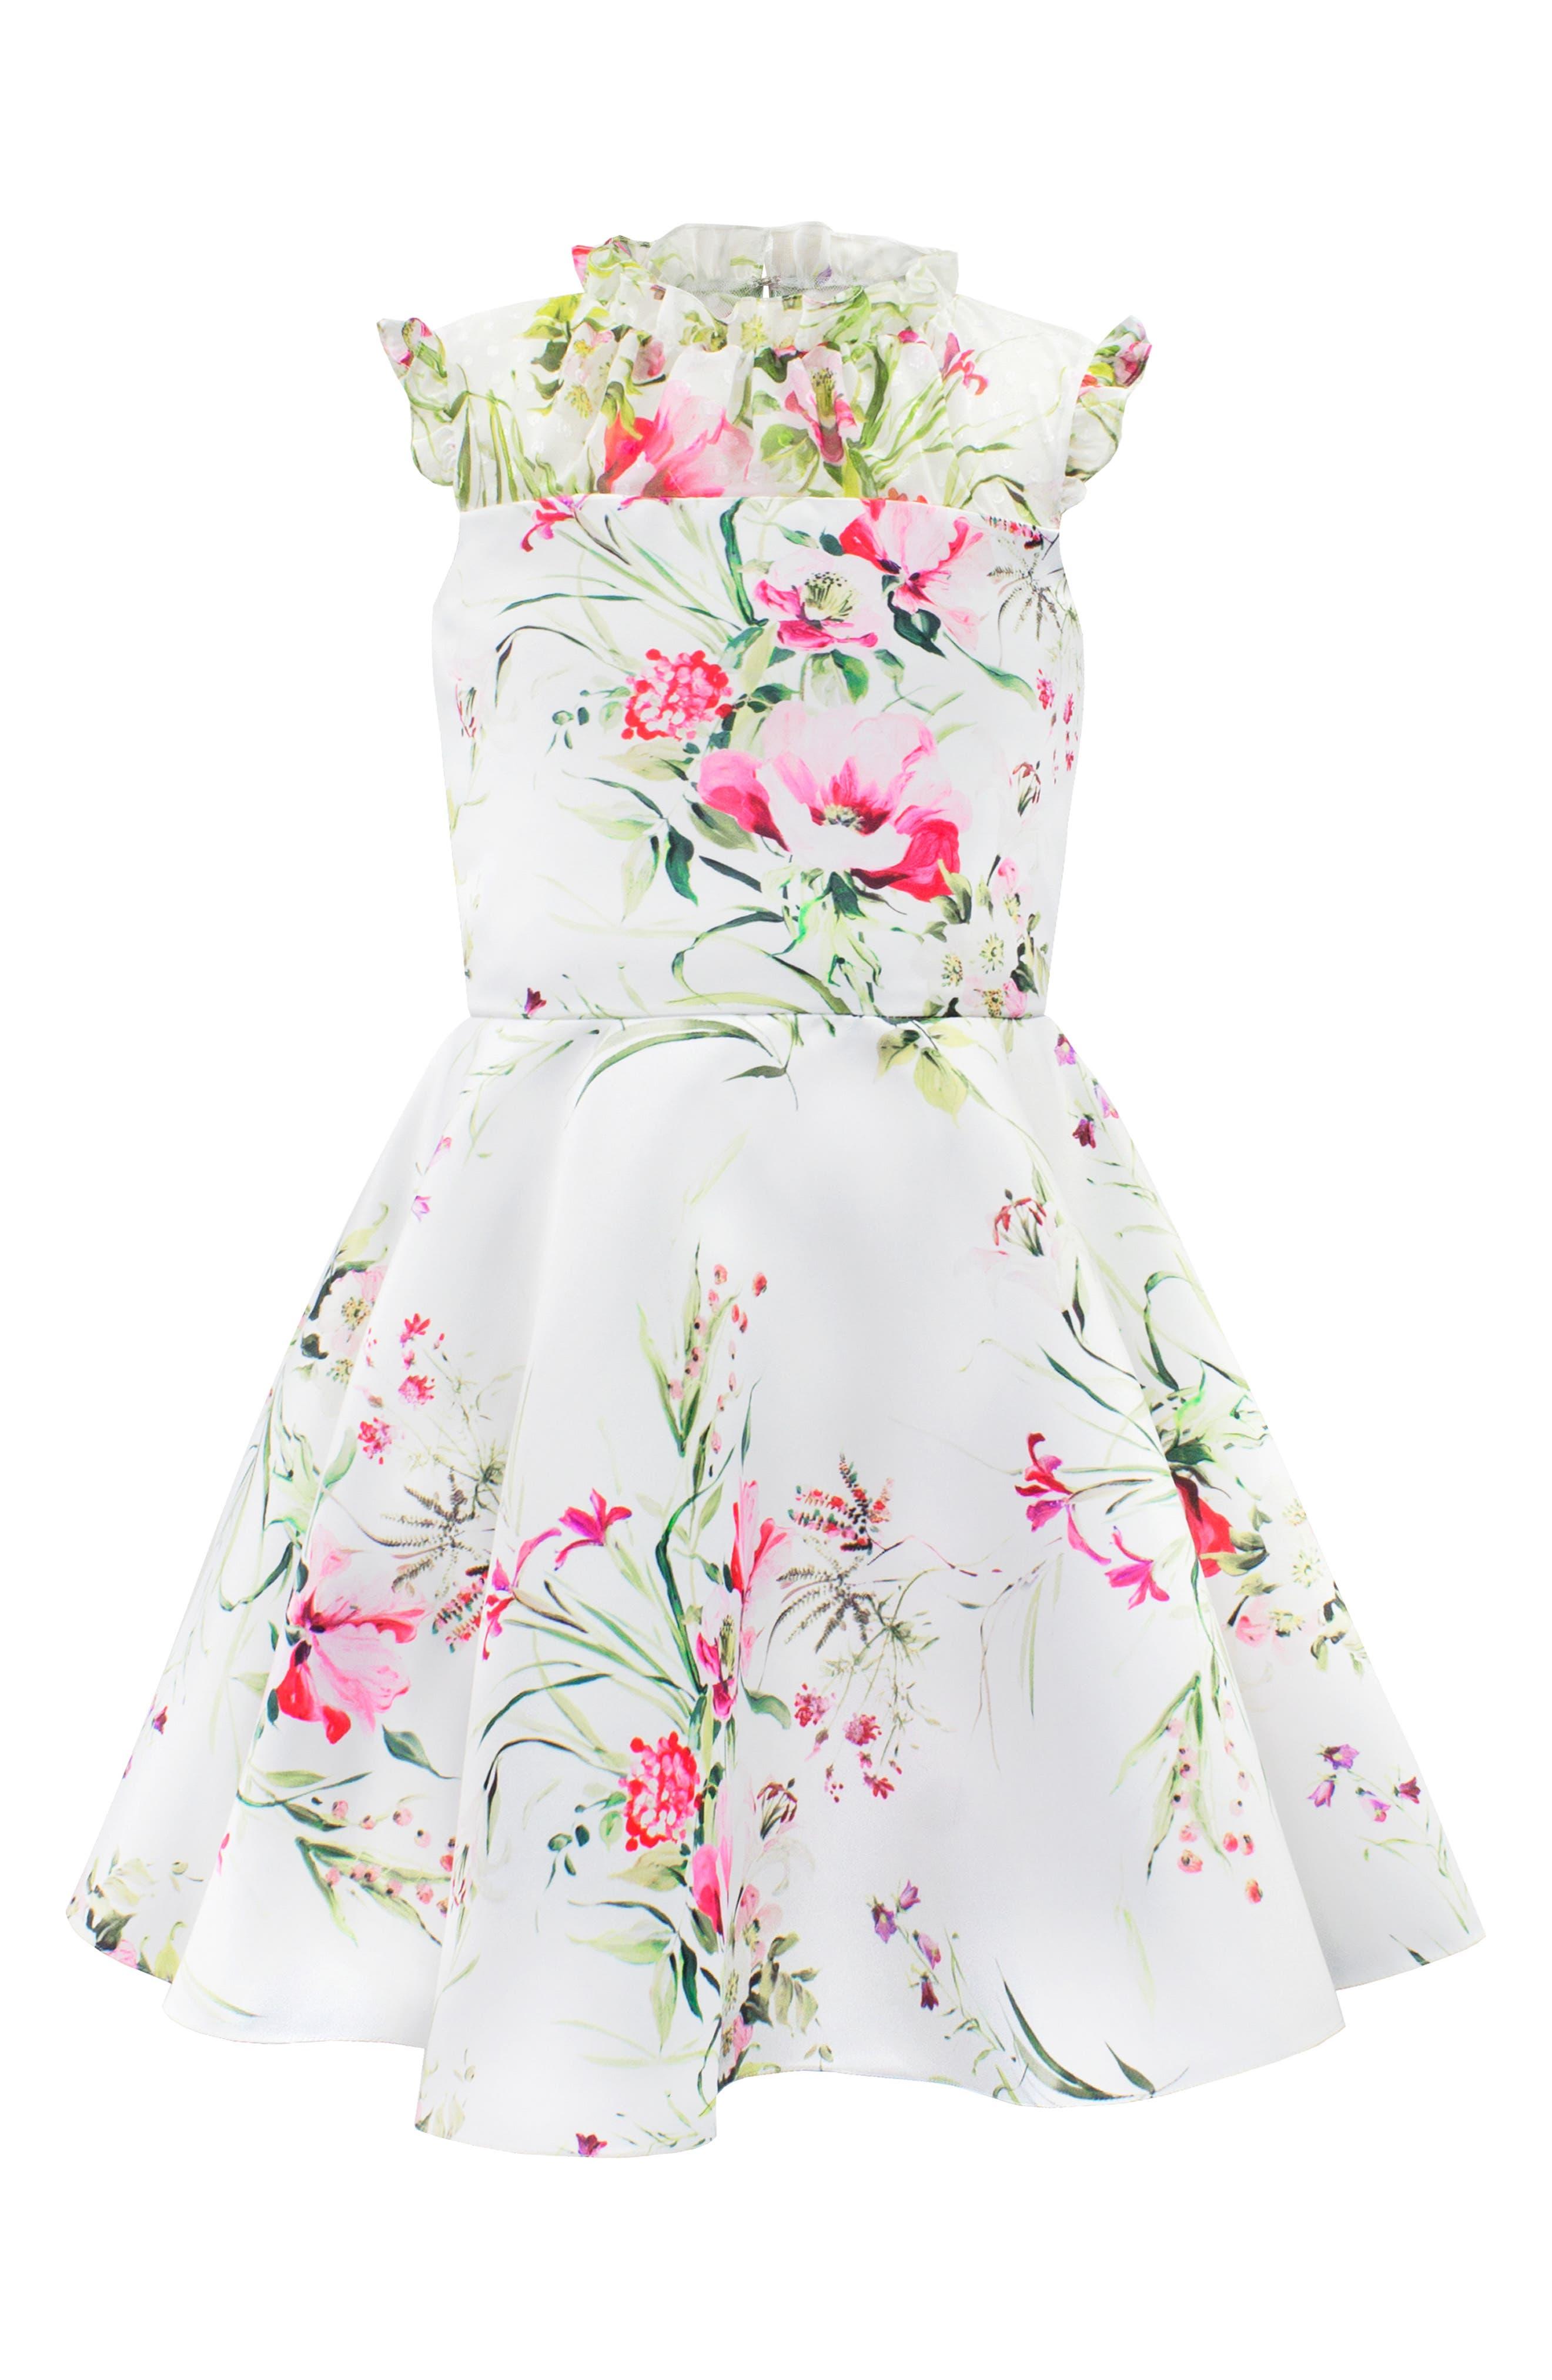 Floral Print Satin & Swiss Dot Party Dress,                             Main thumbnail 1, color,                             IVORY/ PINK